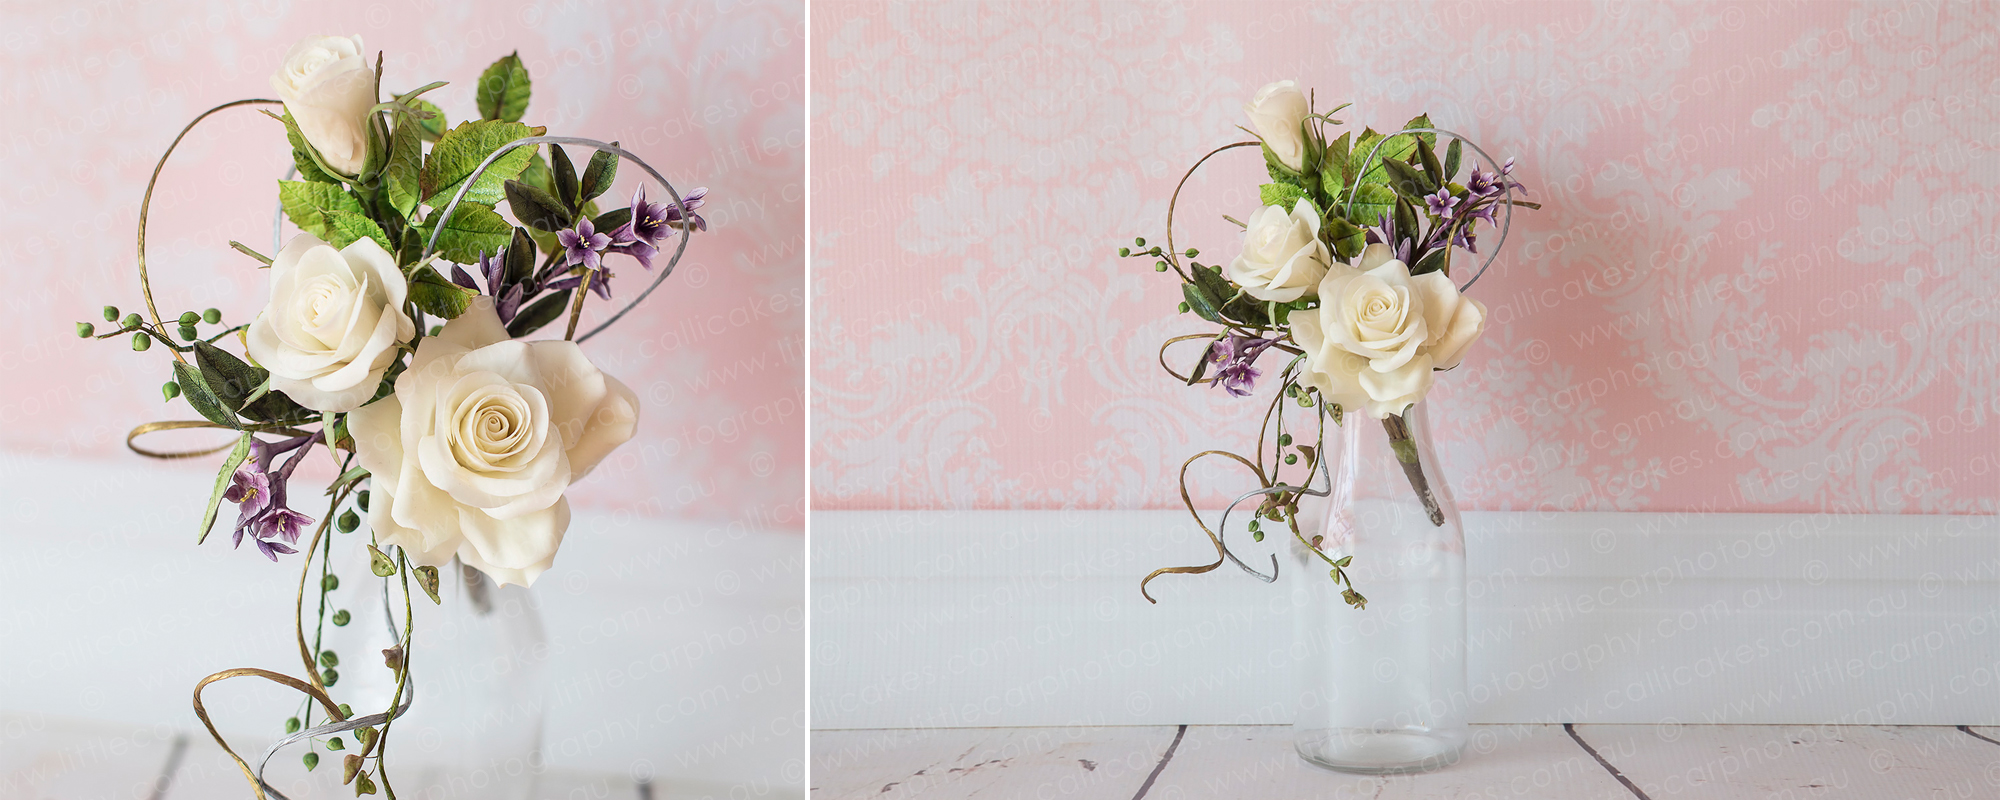 7 Wedding Photography of Sugar Art elegant rose bouquet.jpg